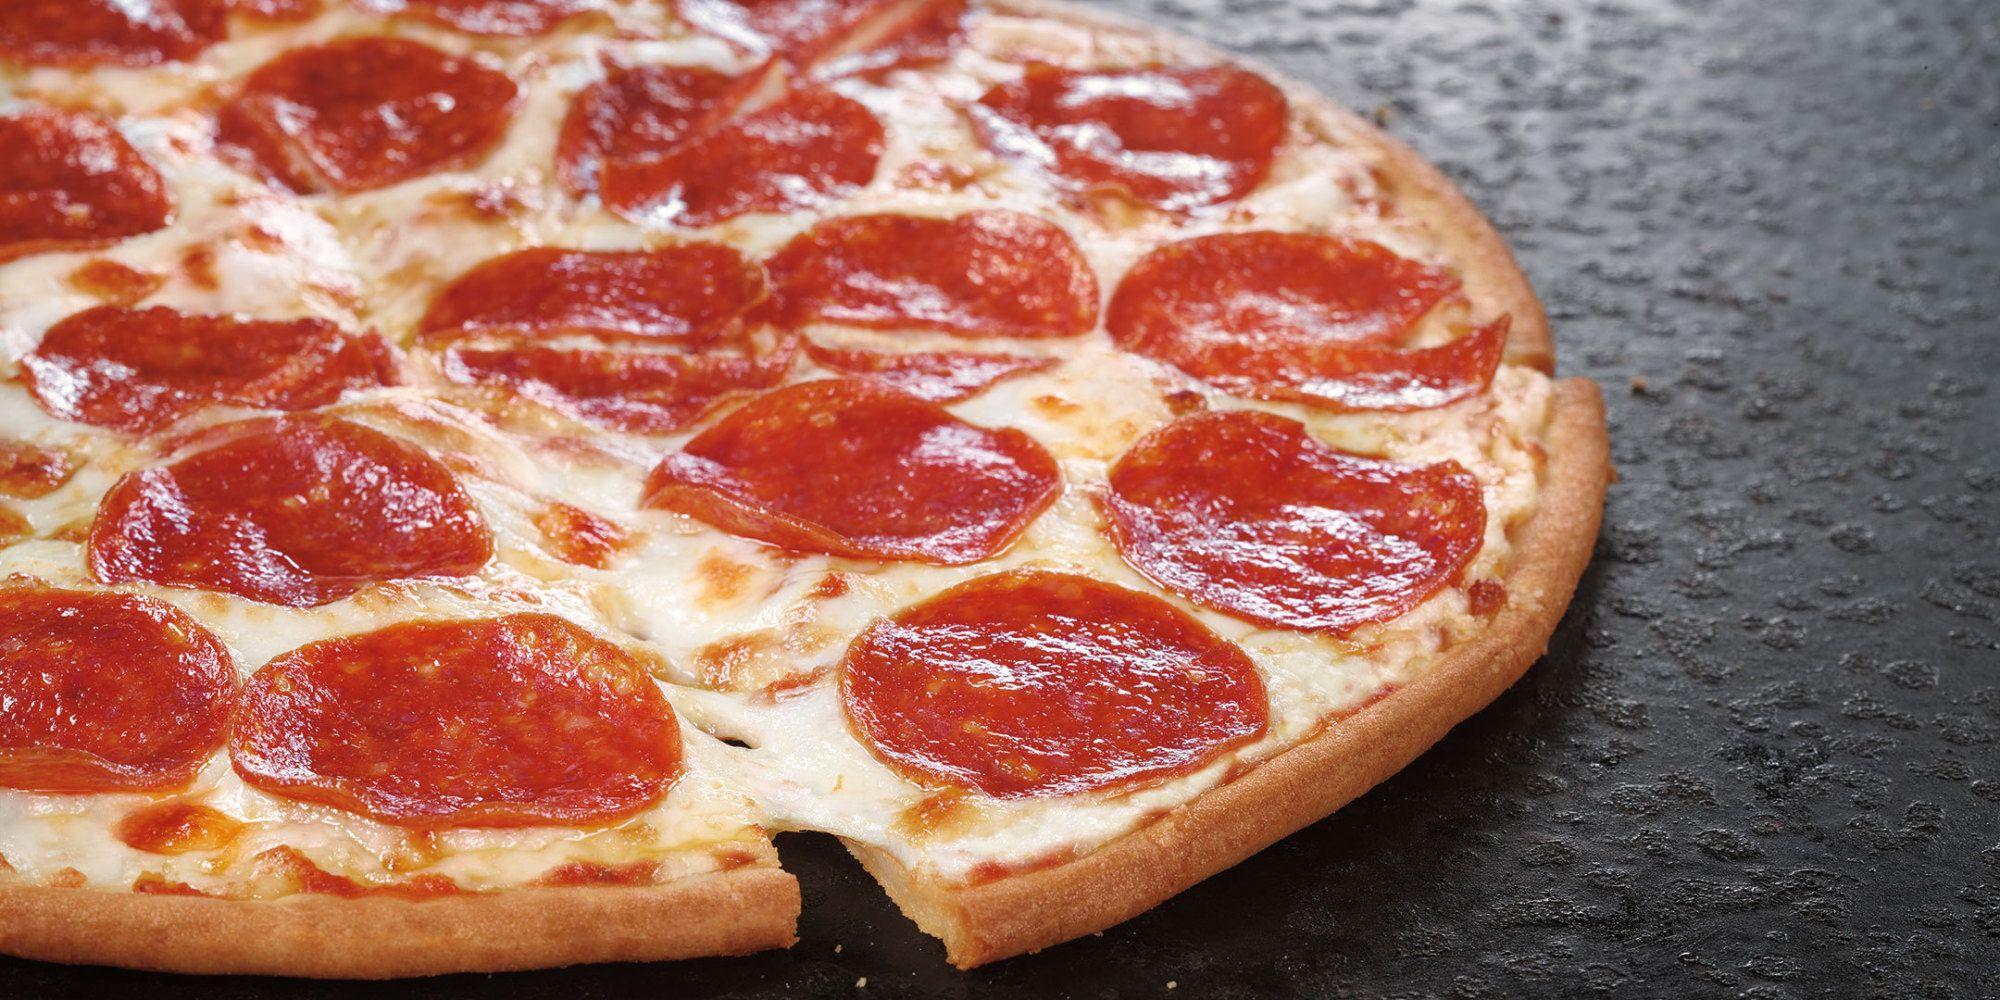 Pizza Hut S Got A New Gluten Free Pizza And They Re Not Fooling Around Gluten Free Pizza Gluten Free Restaurants Pizza Hut Gluten Free